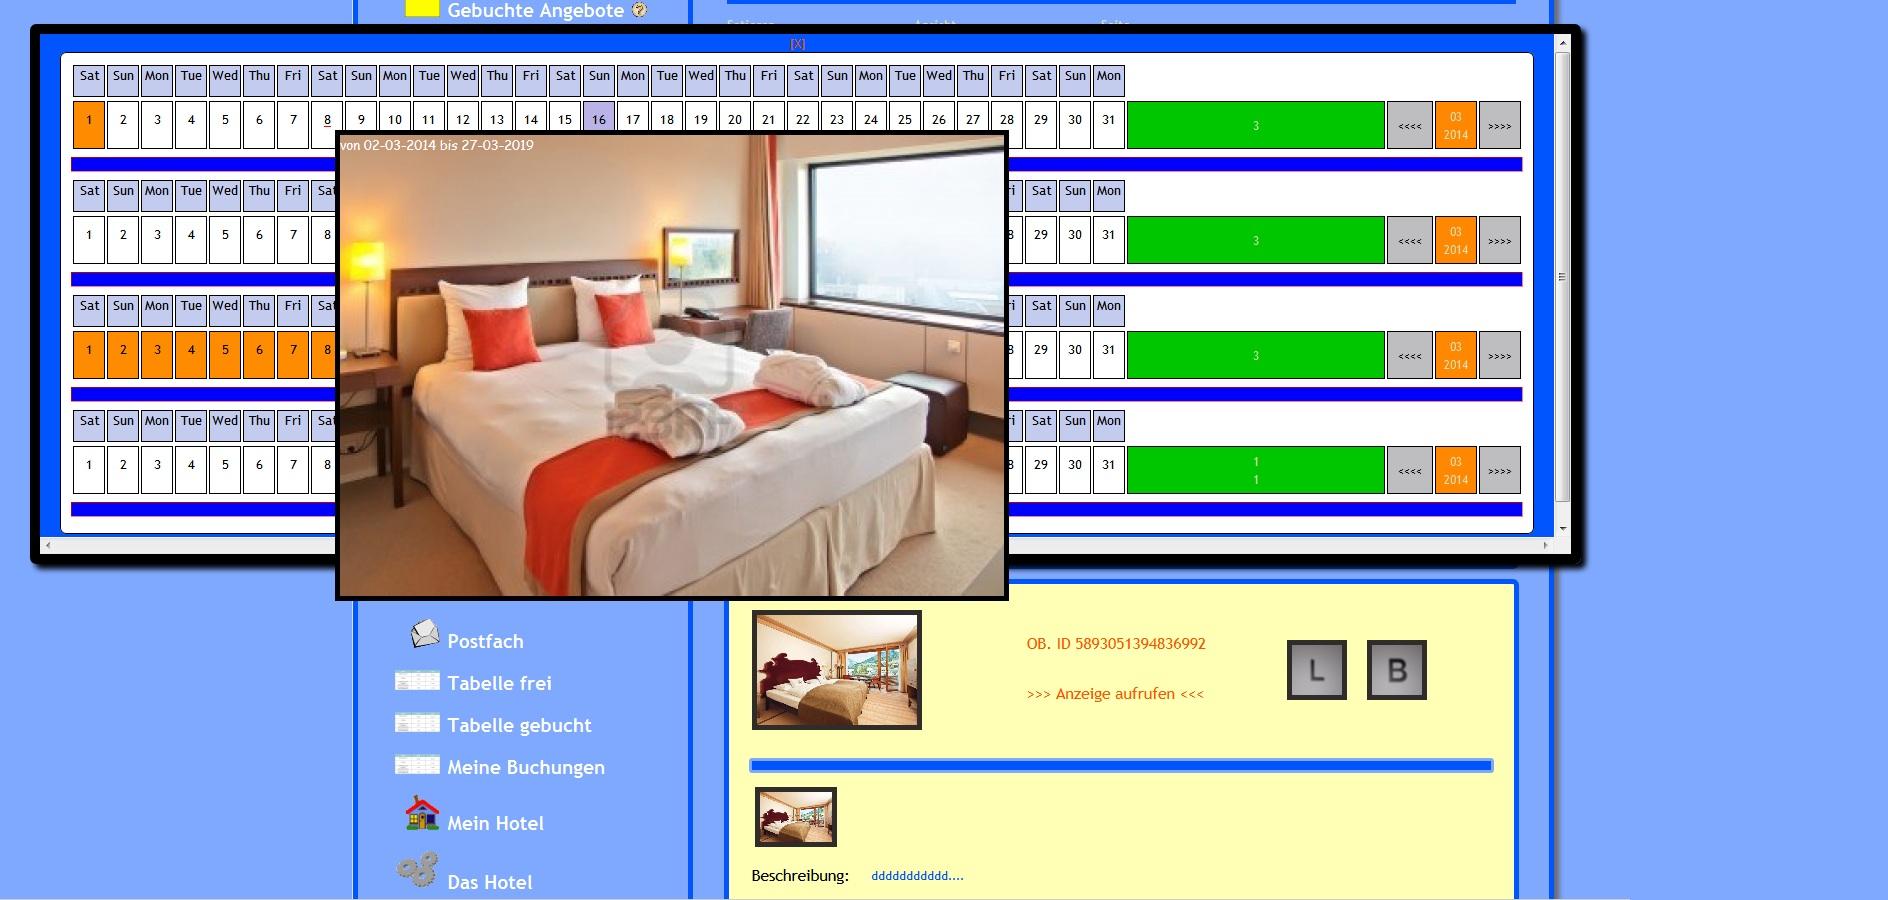 Hotelmanagementsoftware11